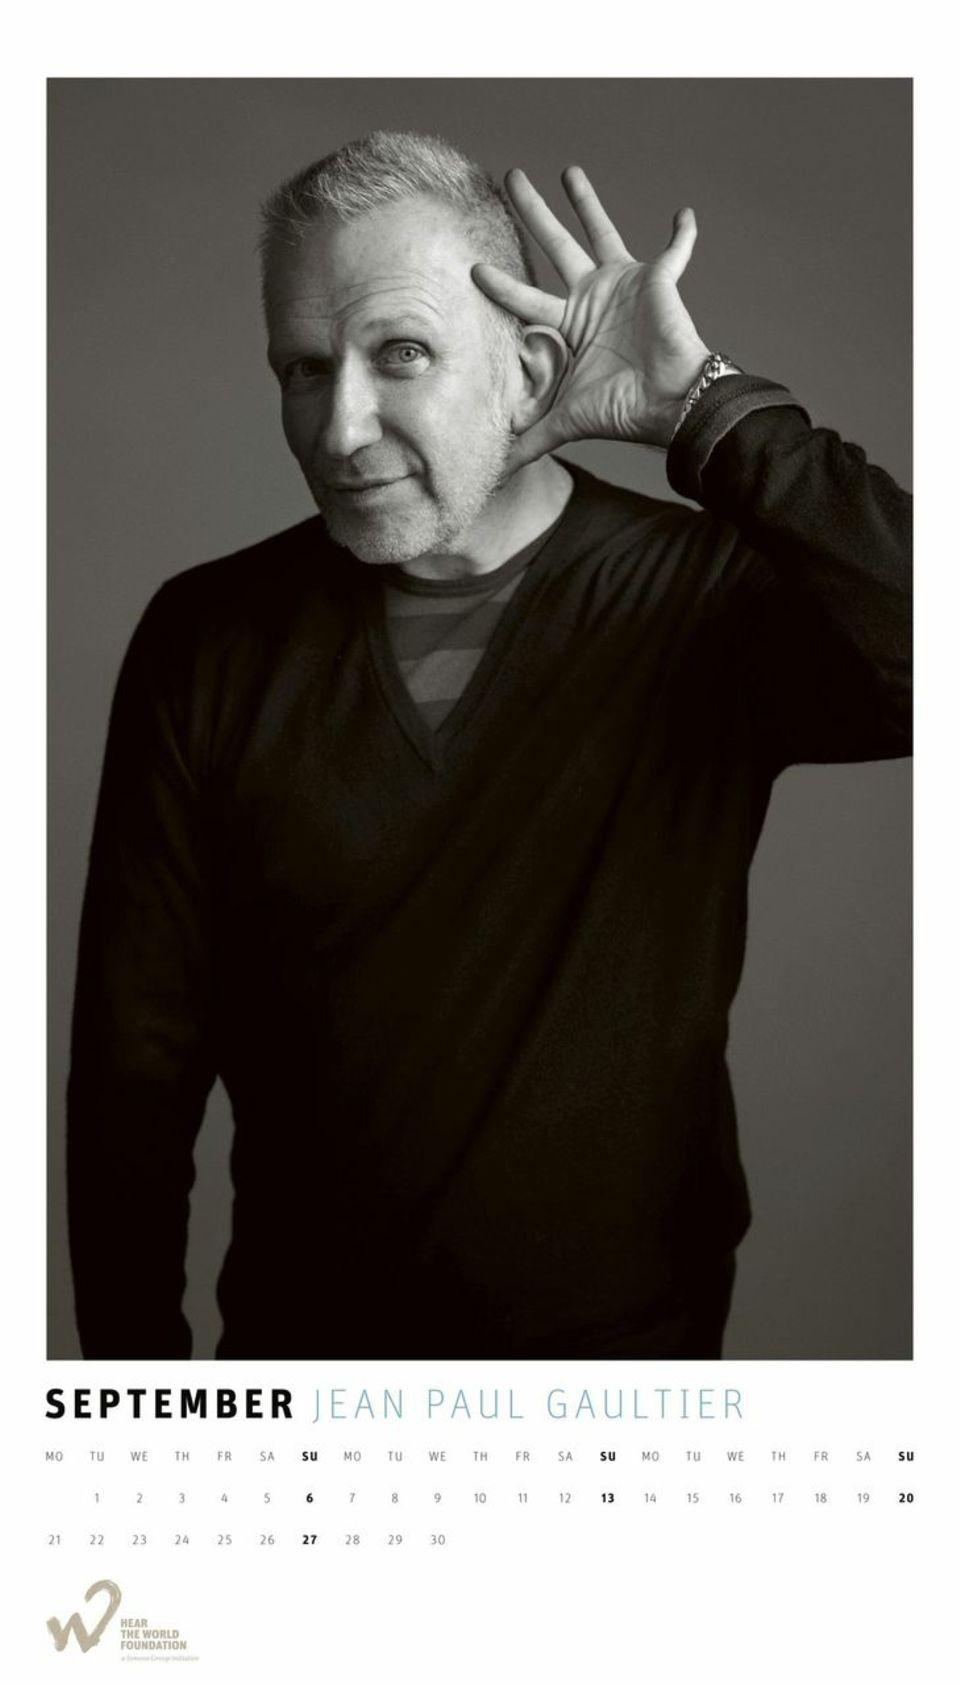 September: Jean Paul Gaultier